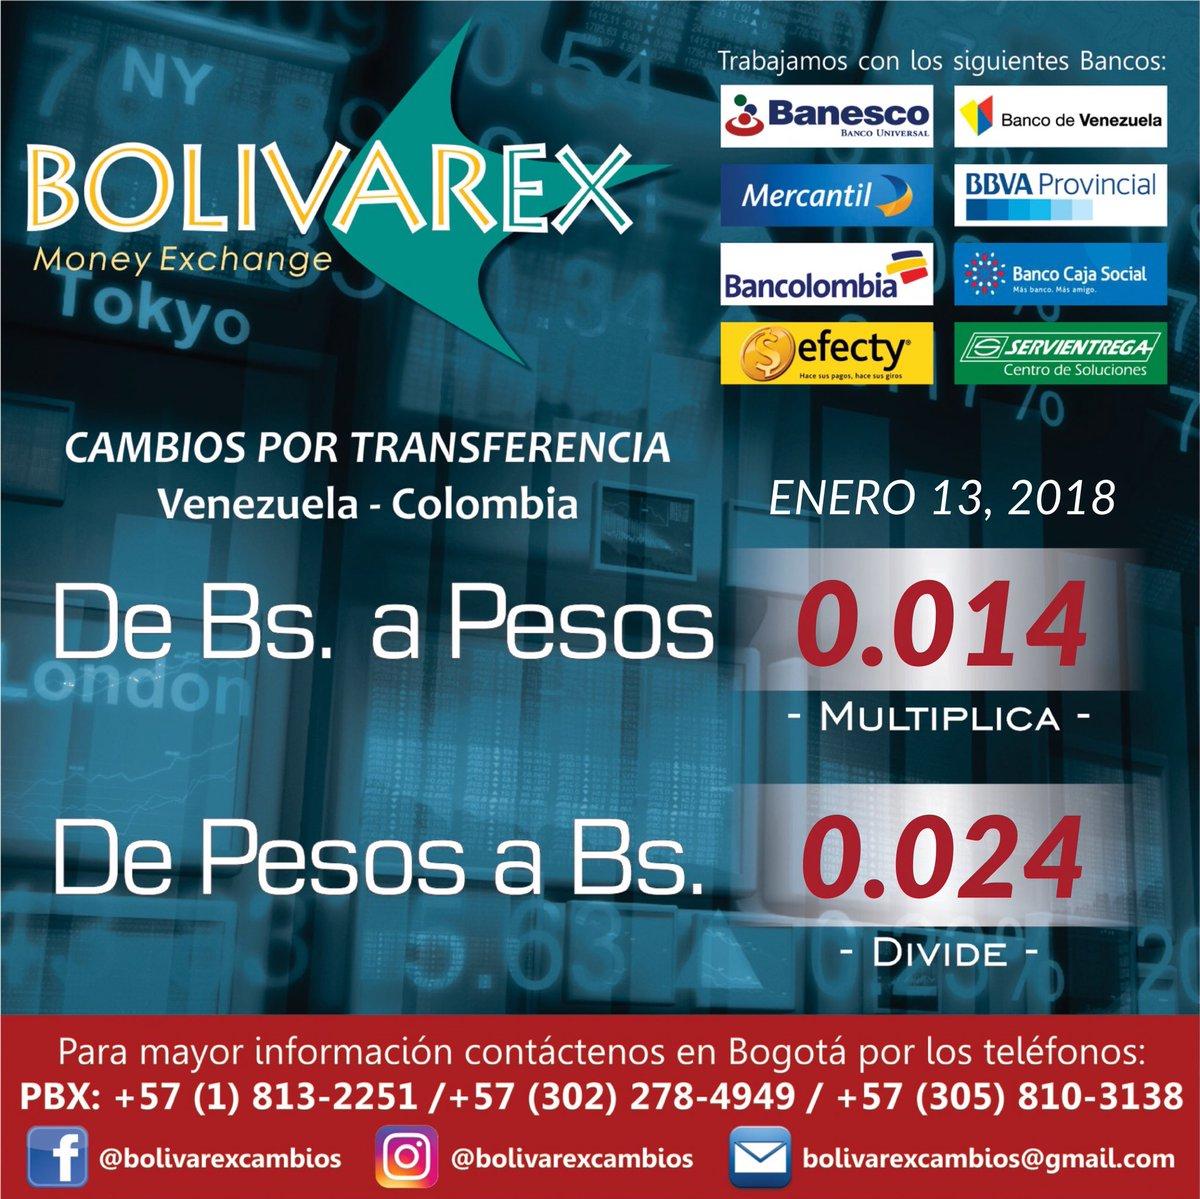 Bolivarex On Twitter Servicio De